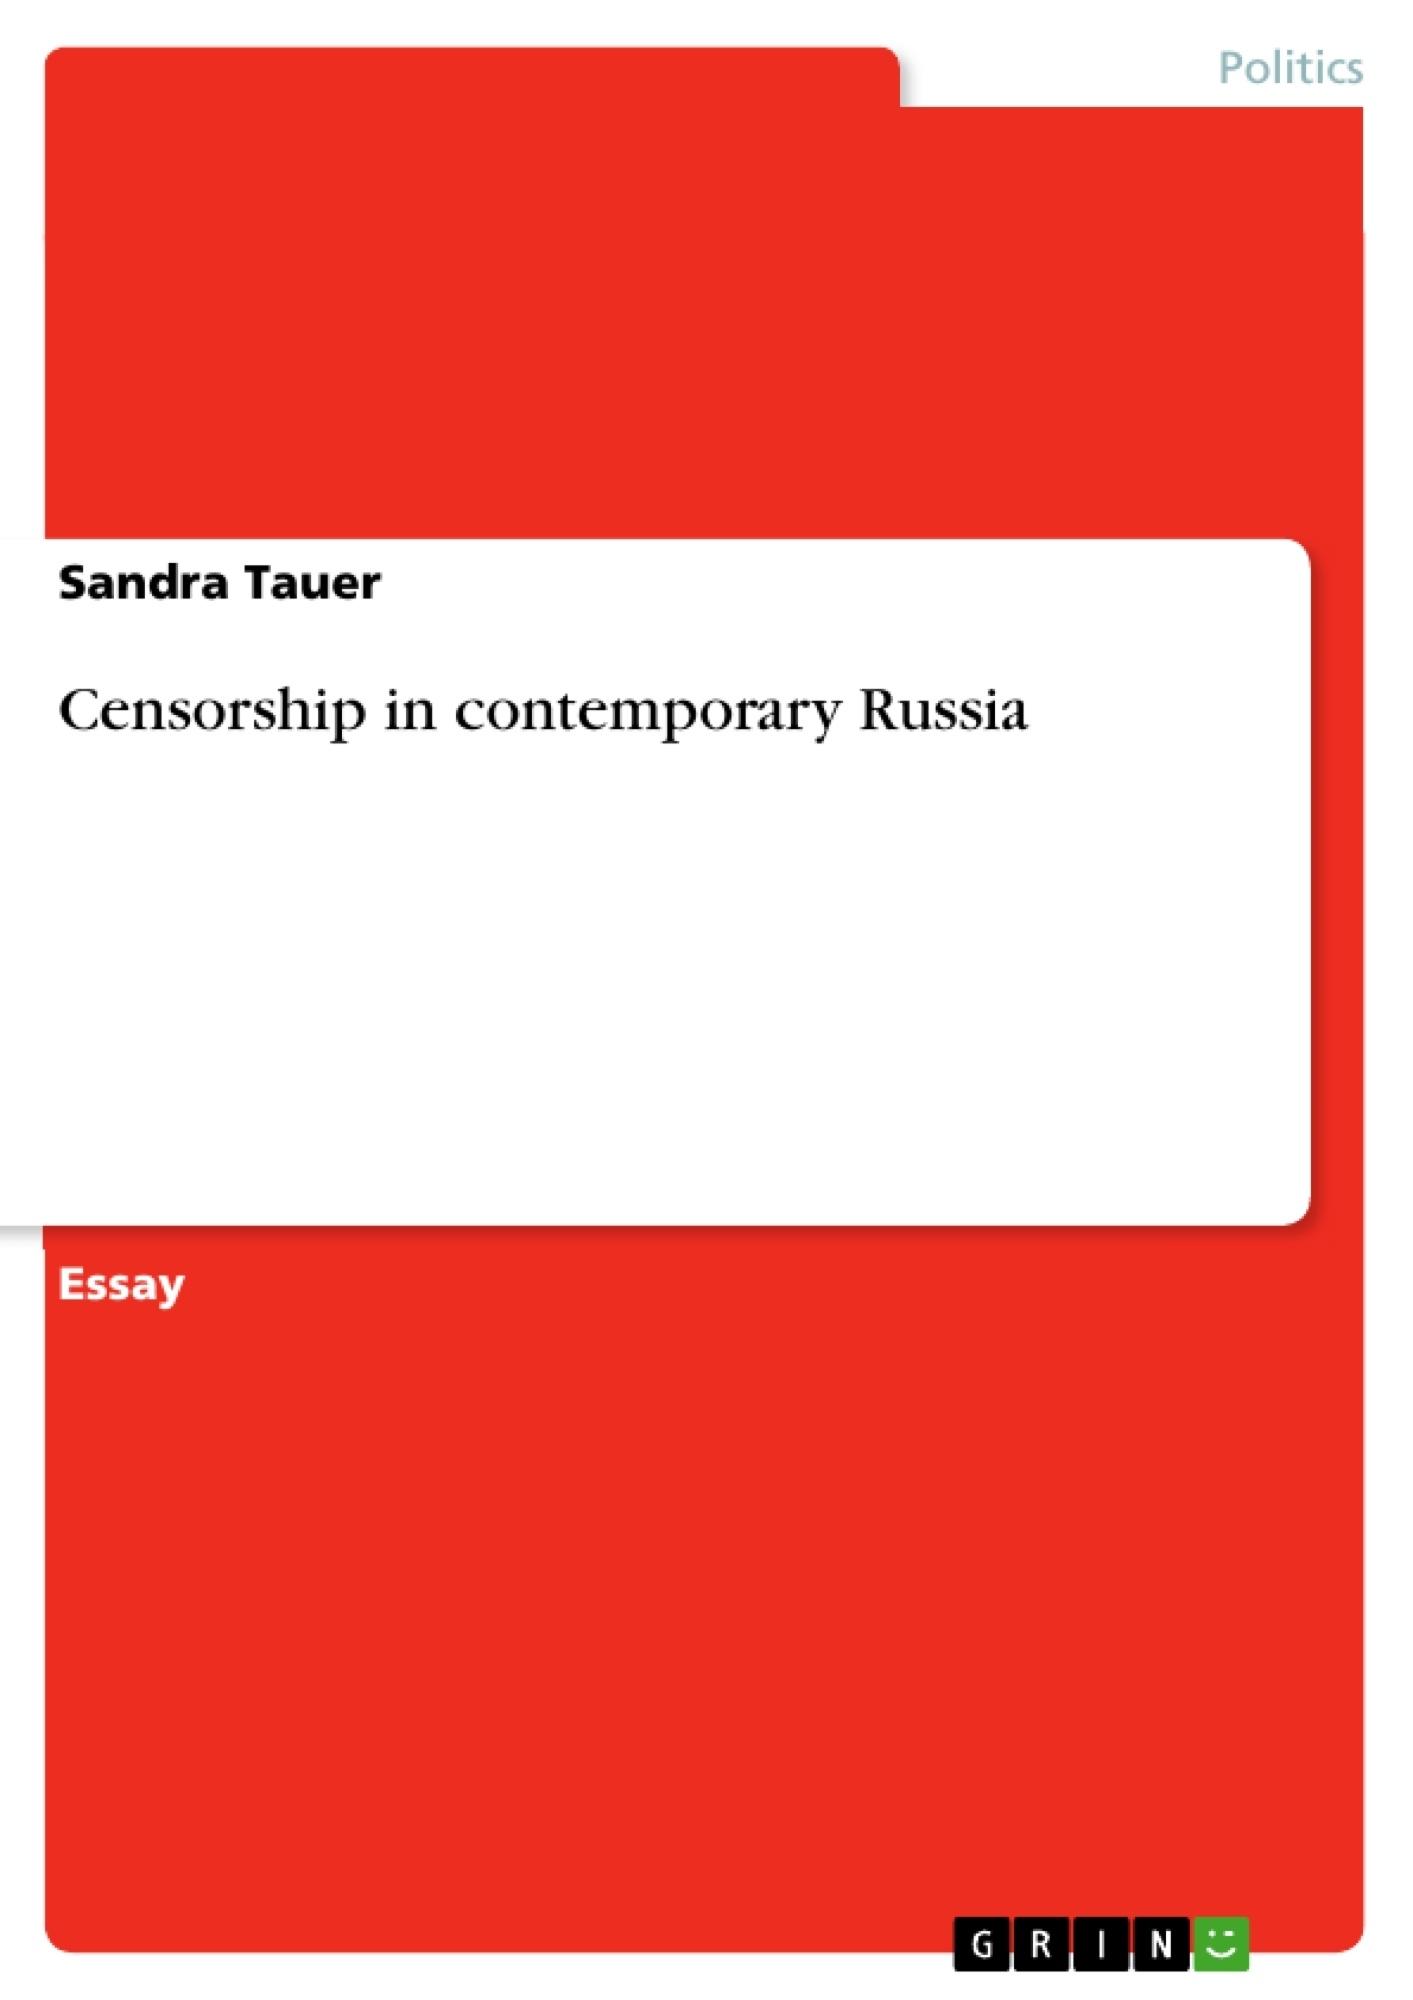 Title: Censorship in contemporary Russia